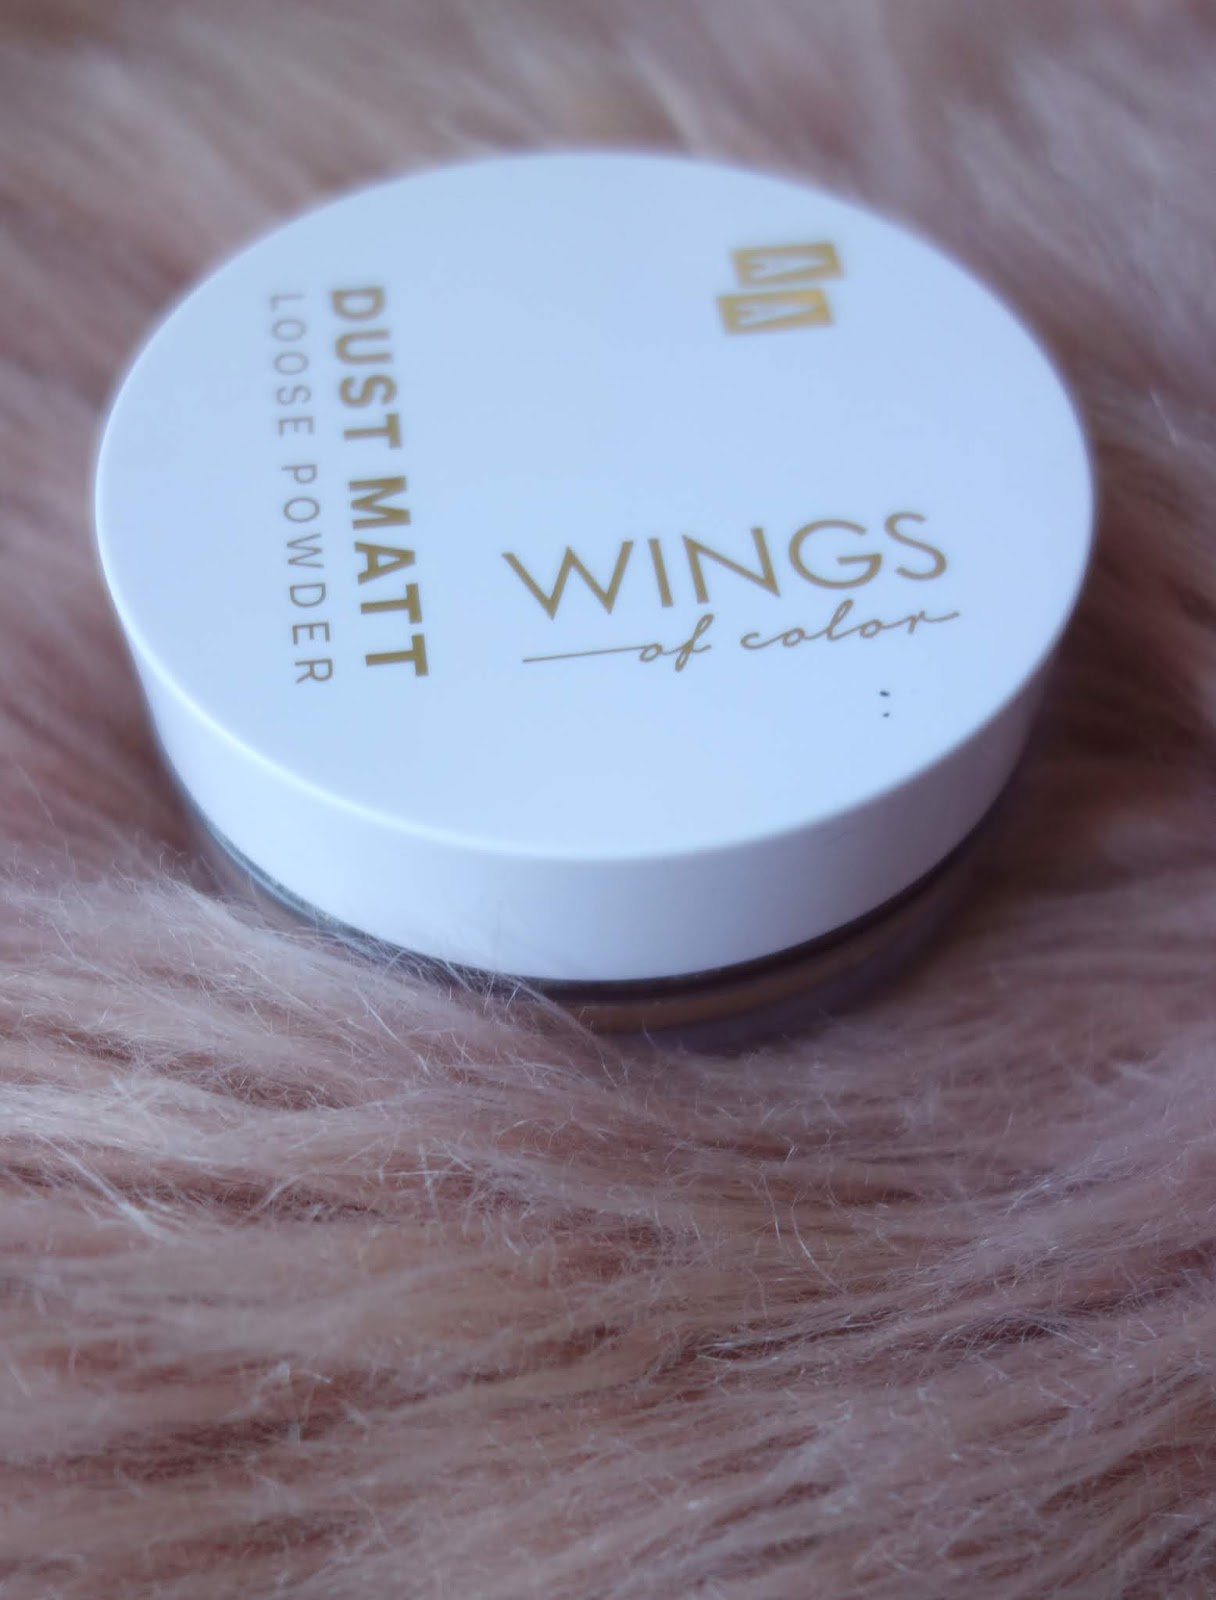 AA Wings of Color Dust Matte Loose Powder   Najlepszy puder sypki z drogerii? Efekt Photoshopa?